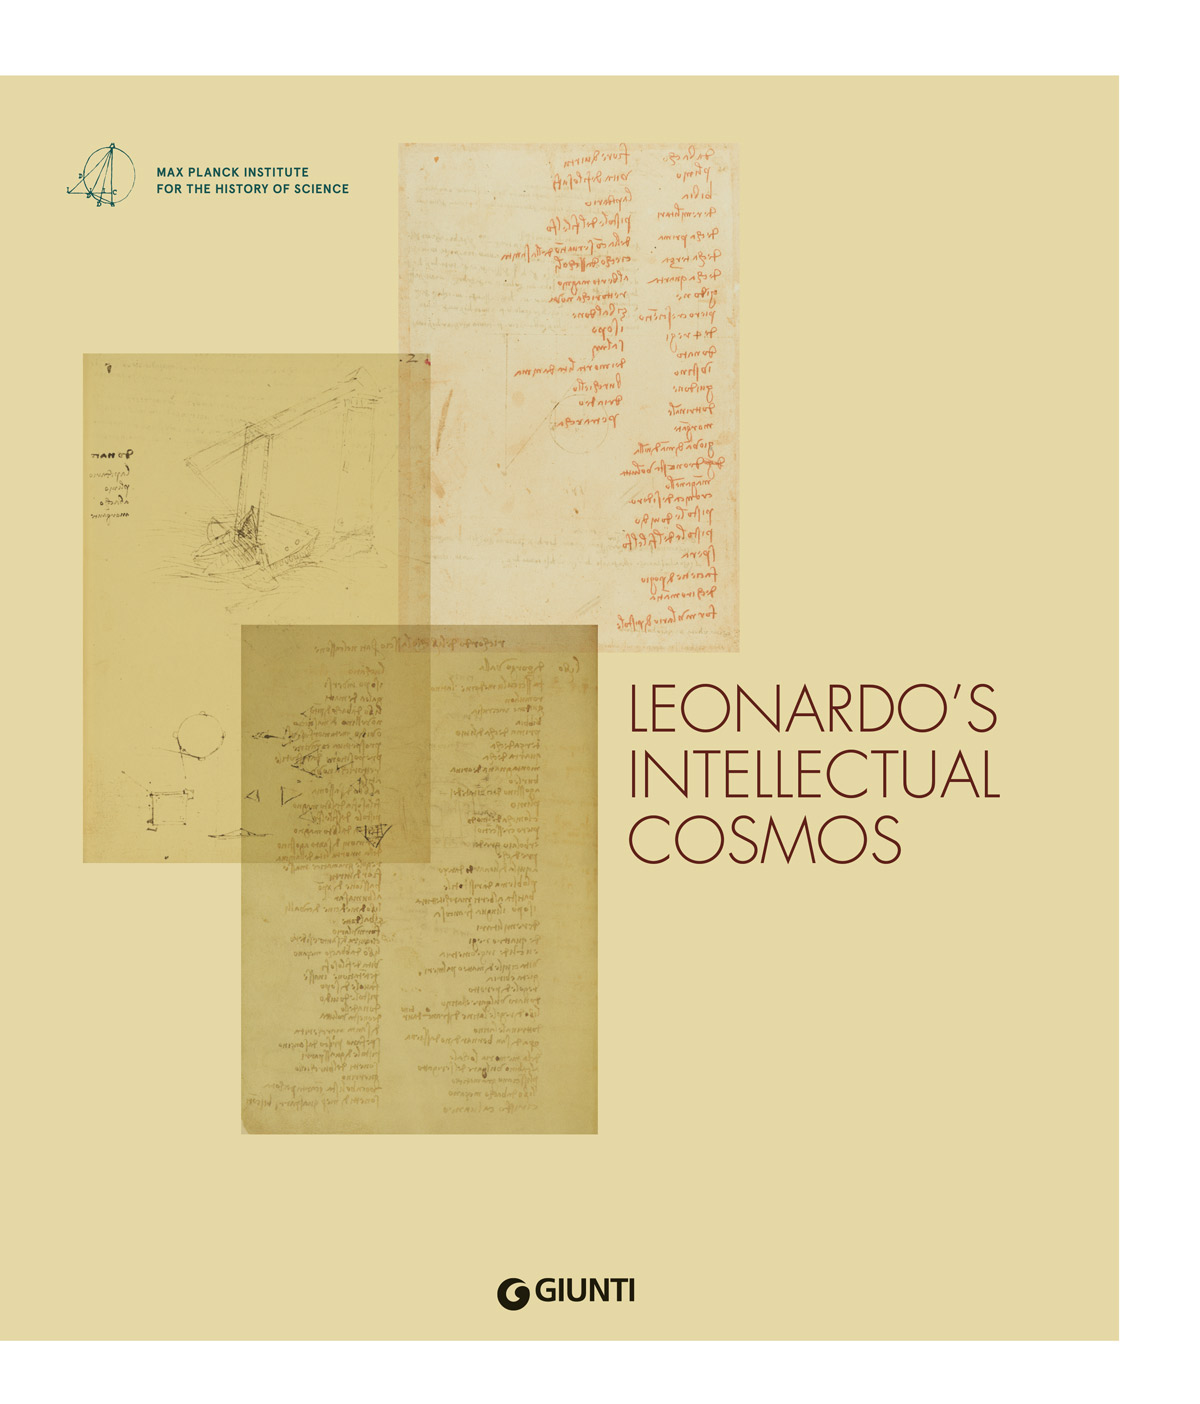 Leonardo's intellectual Cosmos